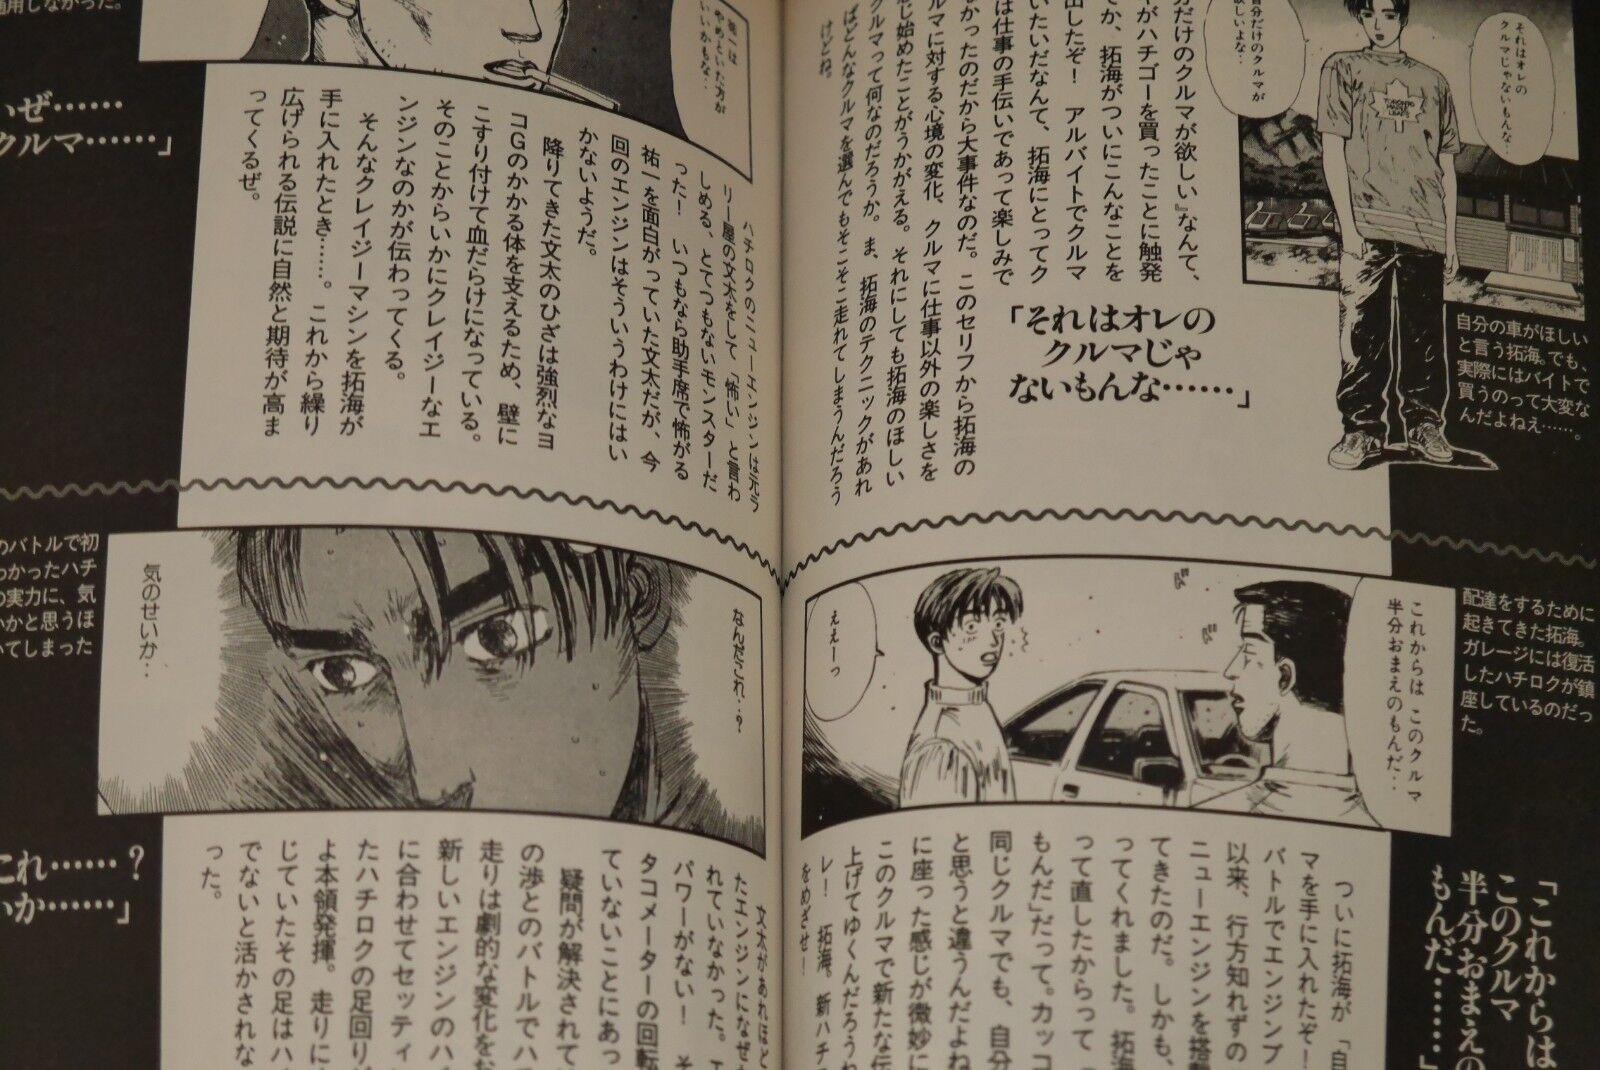 Book JAPAN Baribari Legend /& Initial D Daikaibou Shuichi Shigeno no Sekai